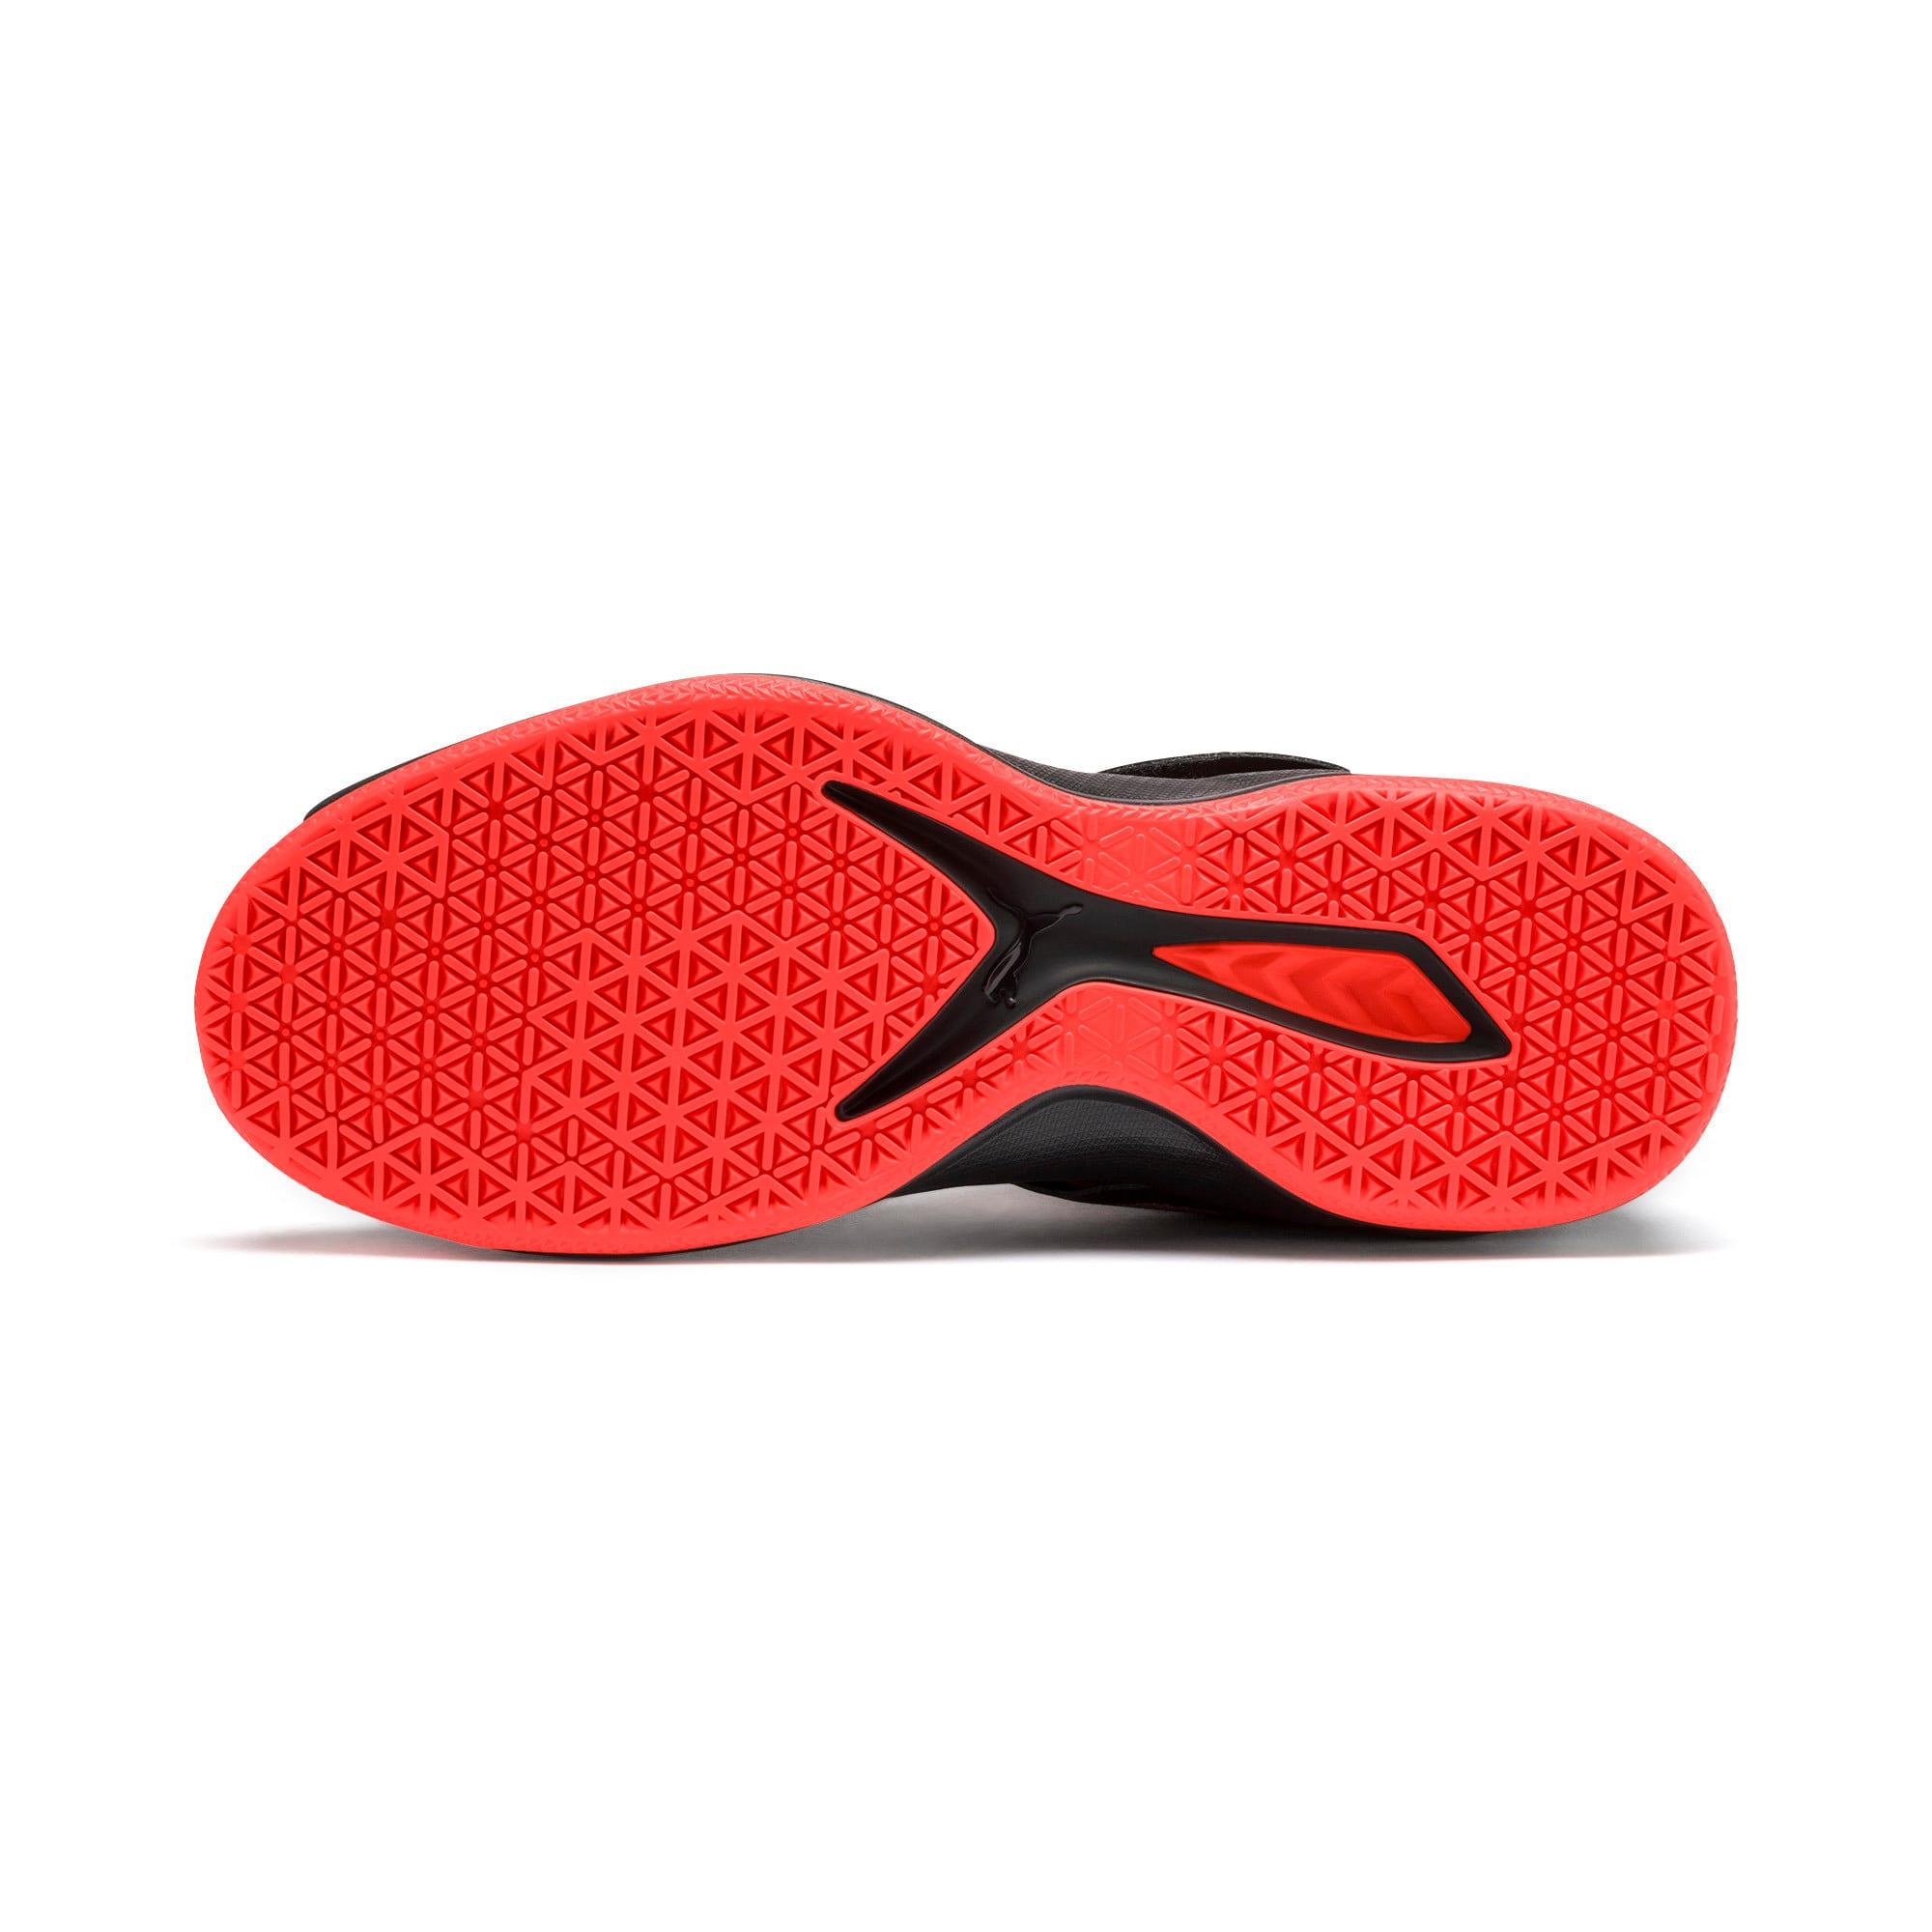 Thumbnail 5 of Rise XT3 NETFIT Handball Shoes, Puma Black-Silver-Nrgy Red, medium